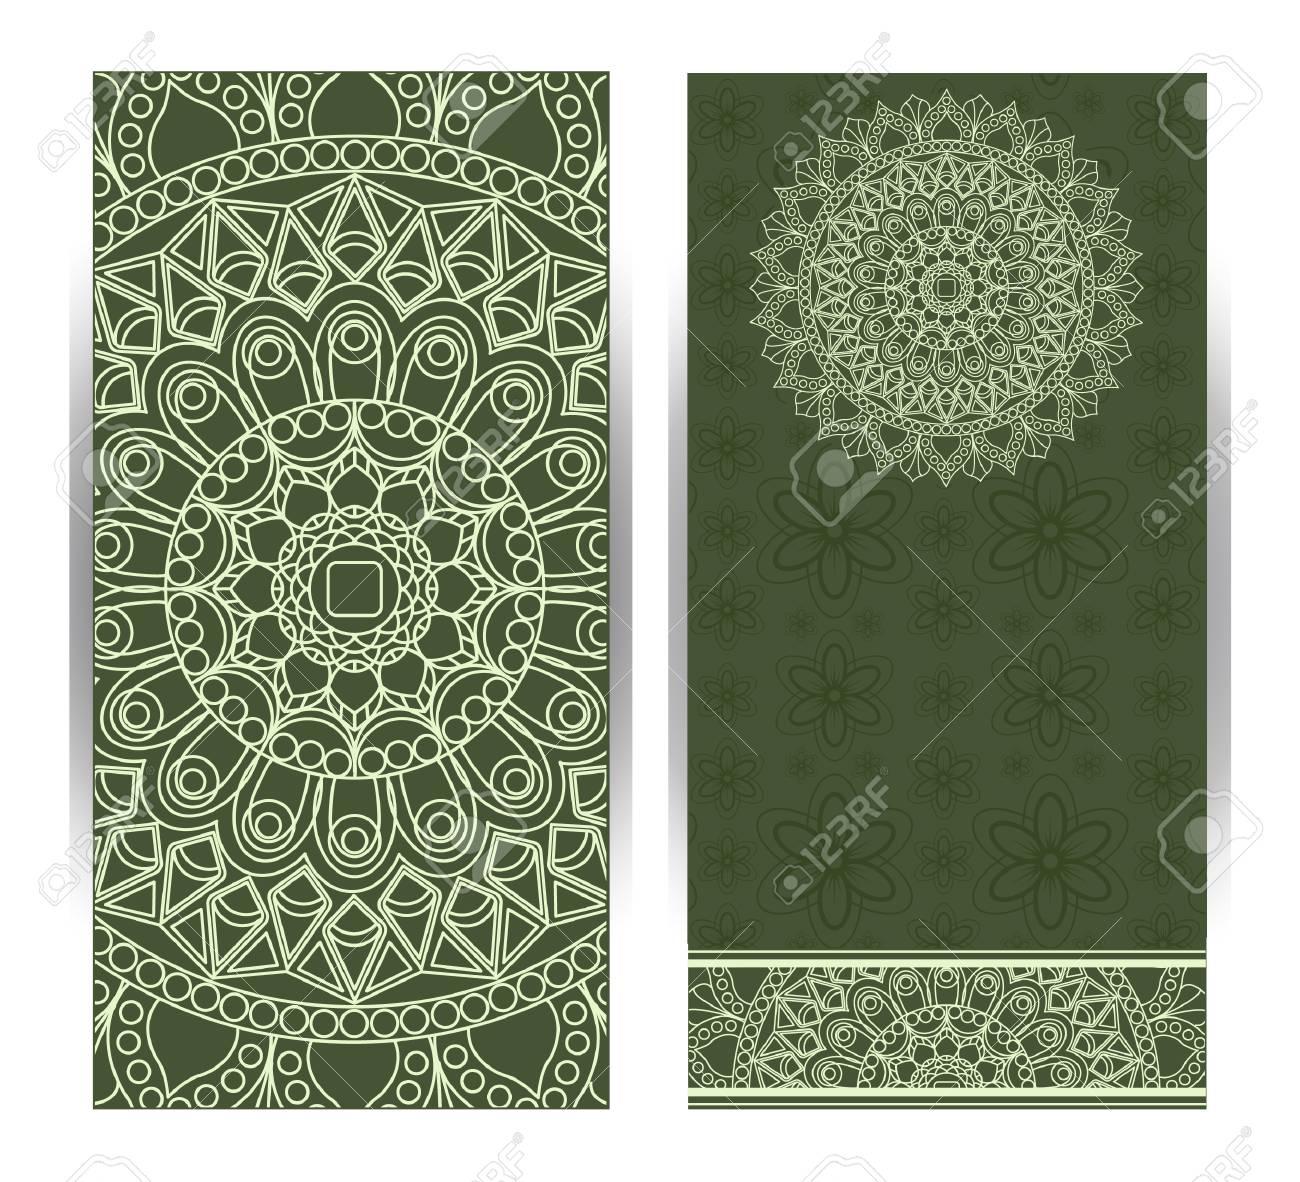 Wedding Invitation Or Card With Abstract Background Islam Arabic Indian Dubai Oriental Design Asian Arab Indian